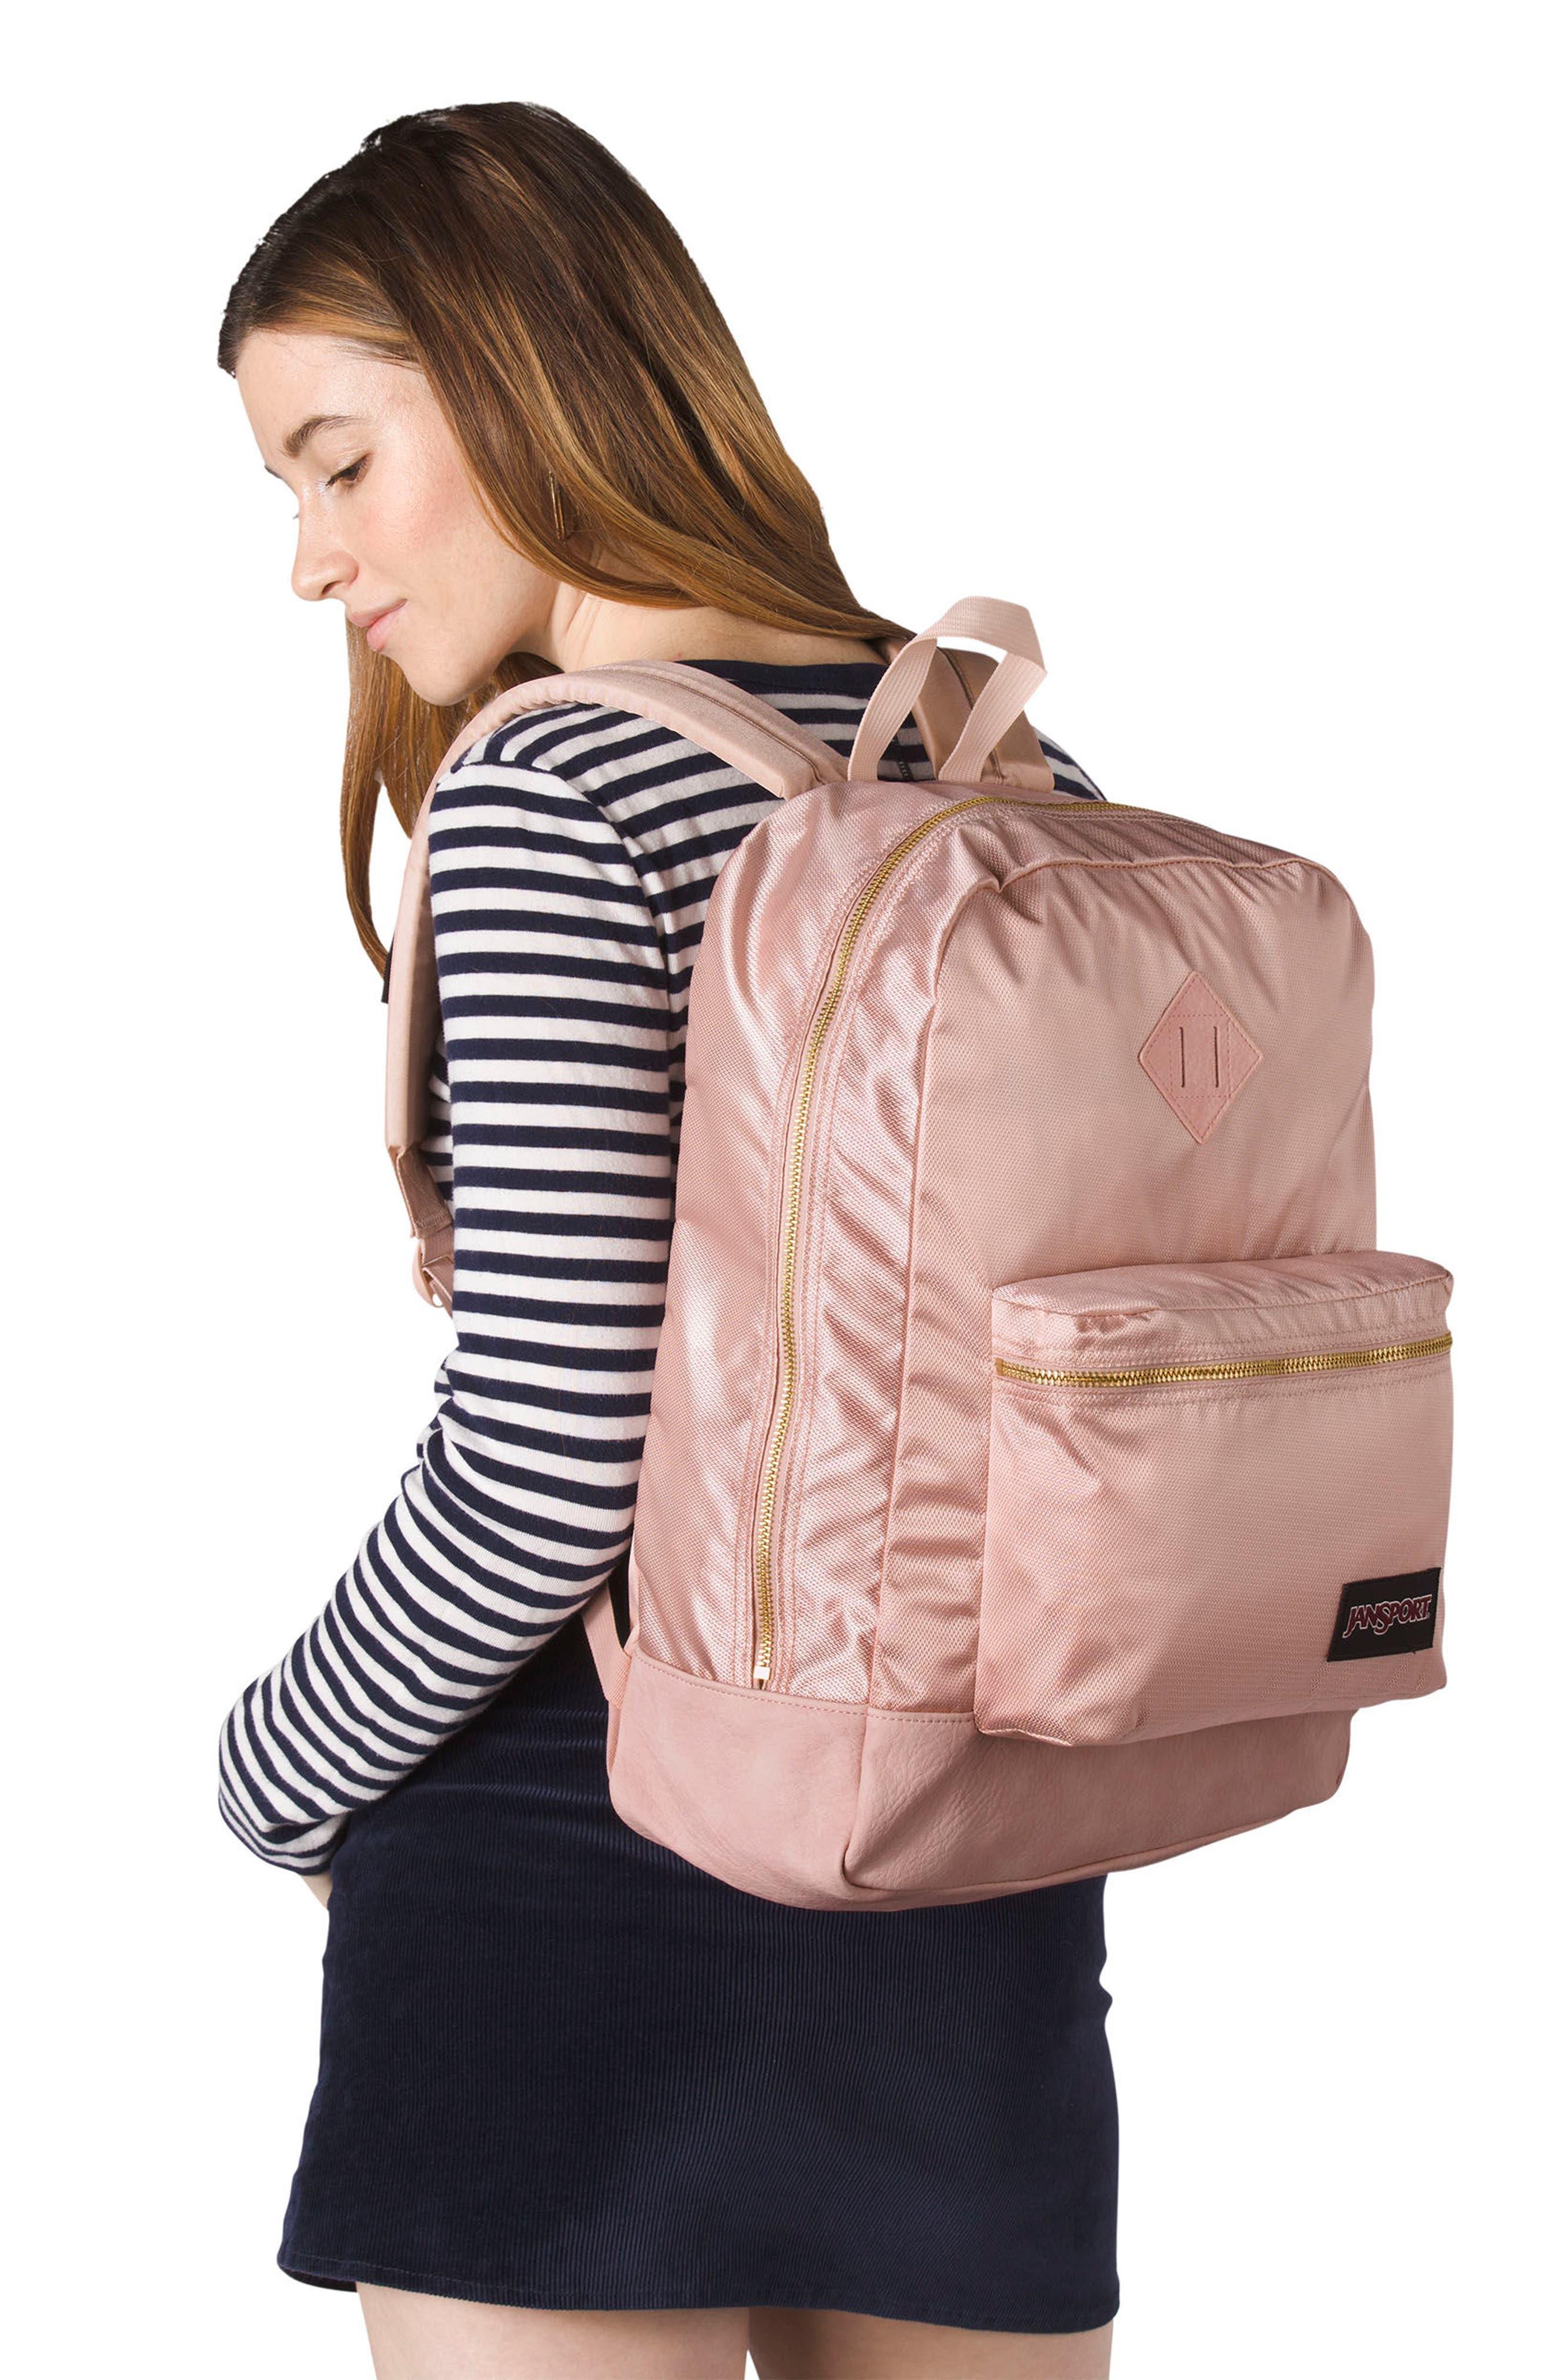 Super FX Gym Backpack,                             Alternate thumbnail 4, color,                             ROSE SMOKE GOLD